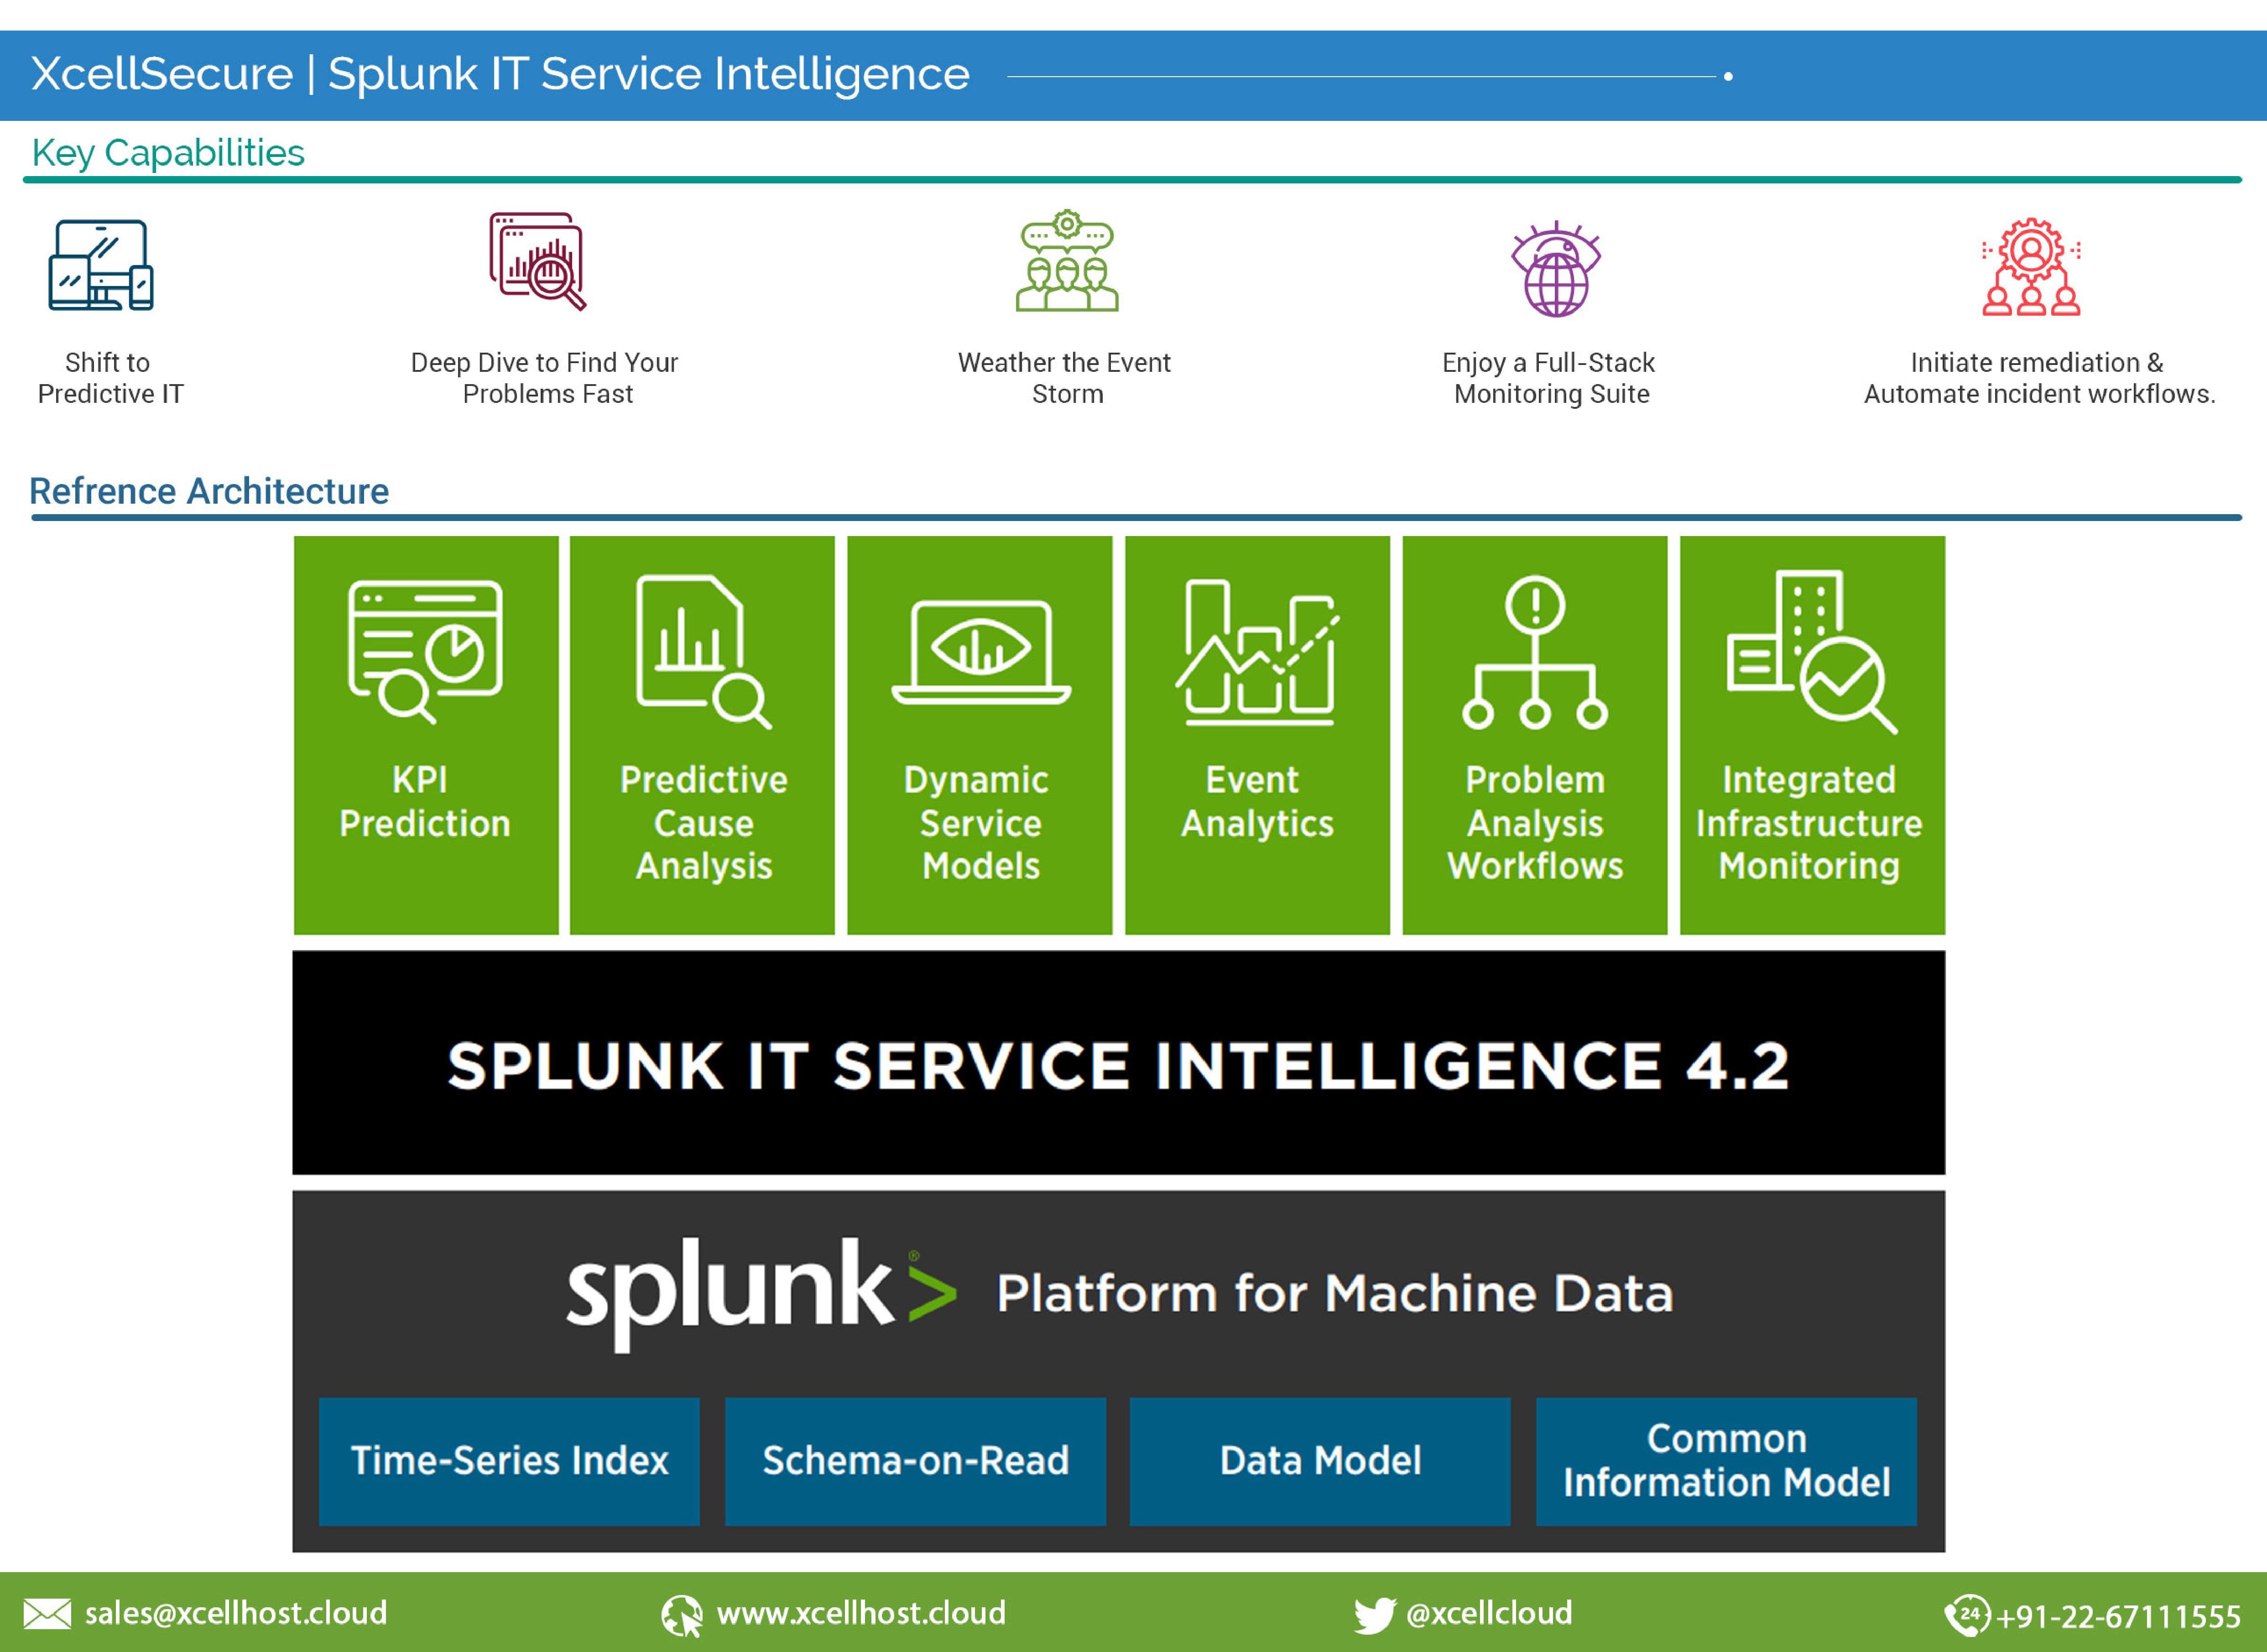 XLIN-33 Splunk-as-a-Service-page-004